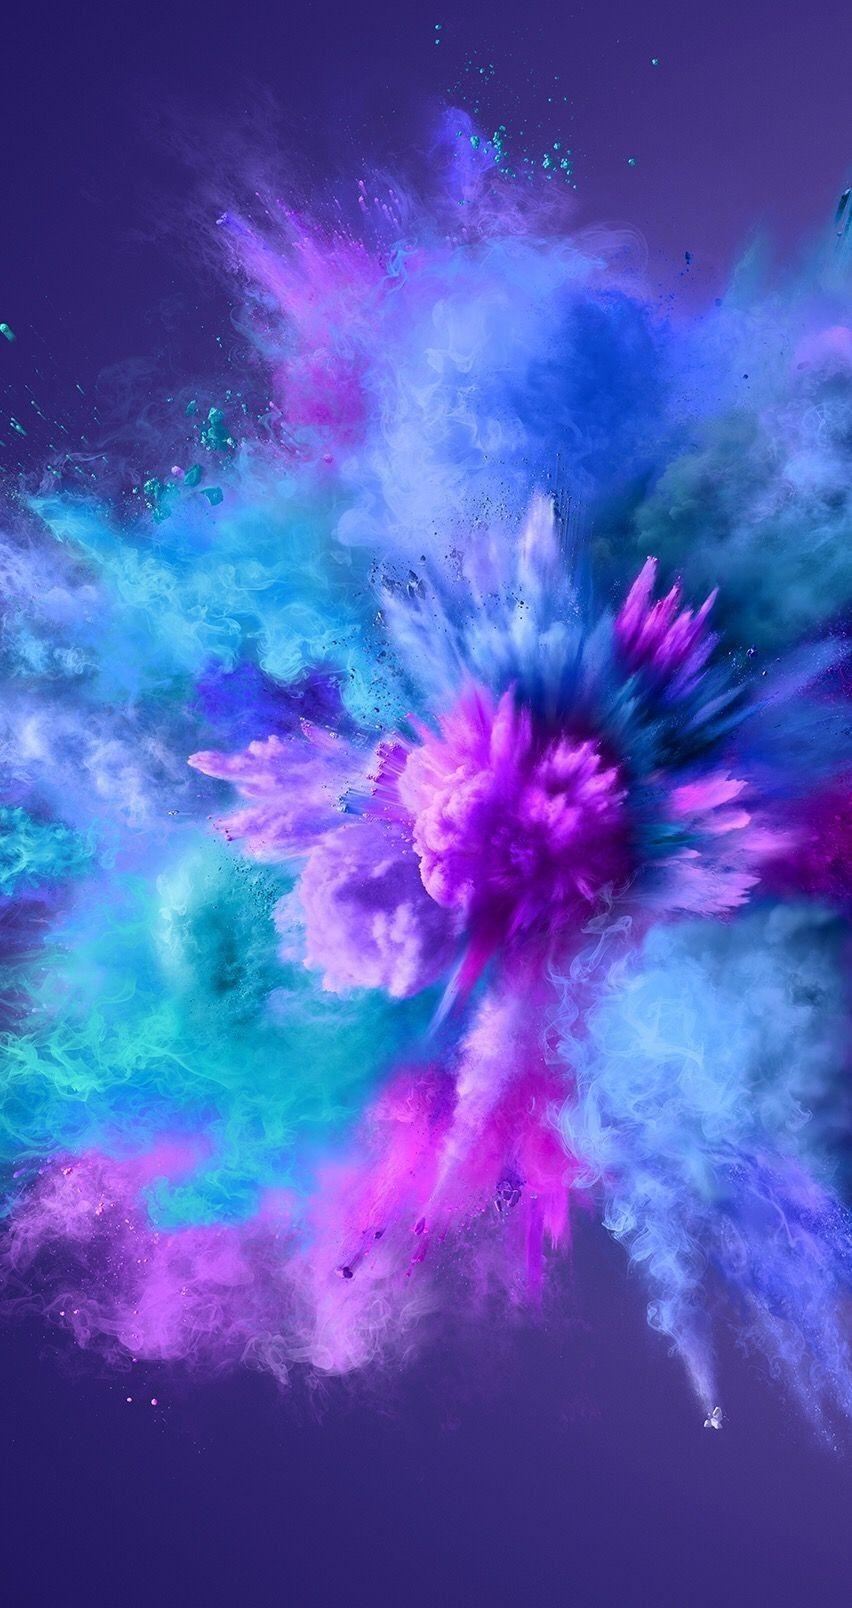 By Elysian Iphone Wallpaper Colorful Wallpaper Galaxy Wallpaper